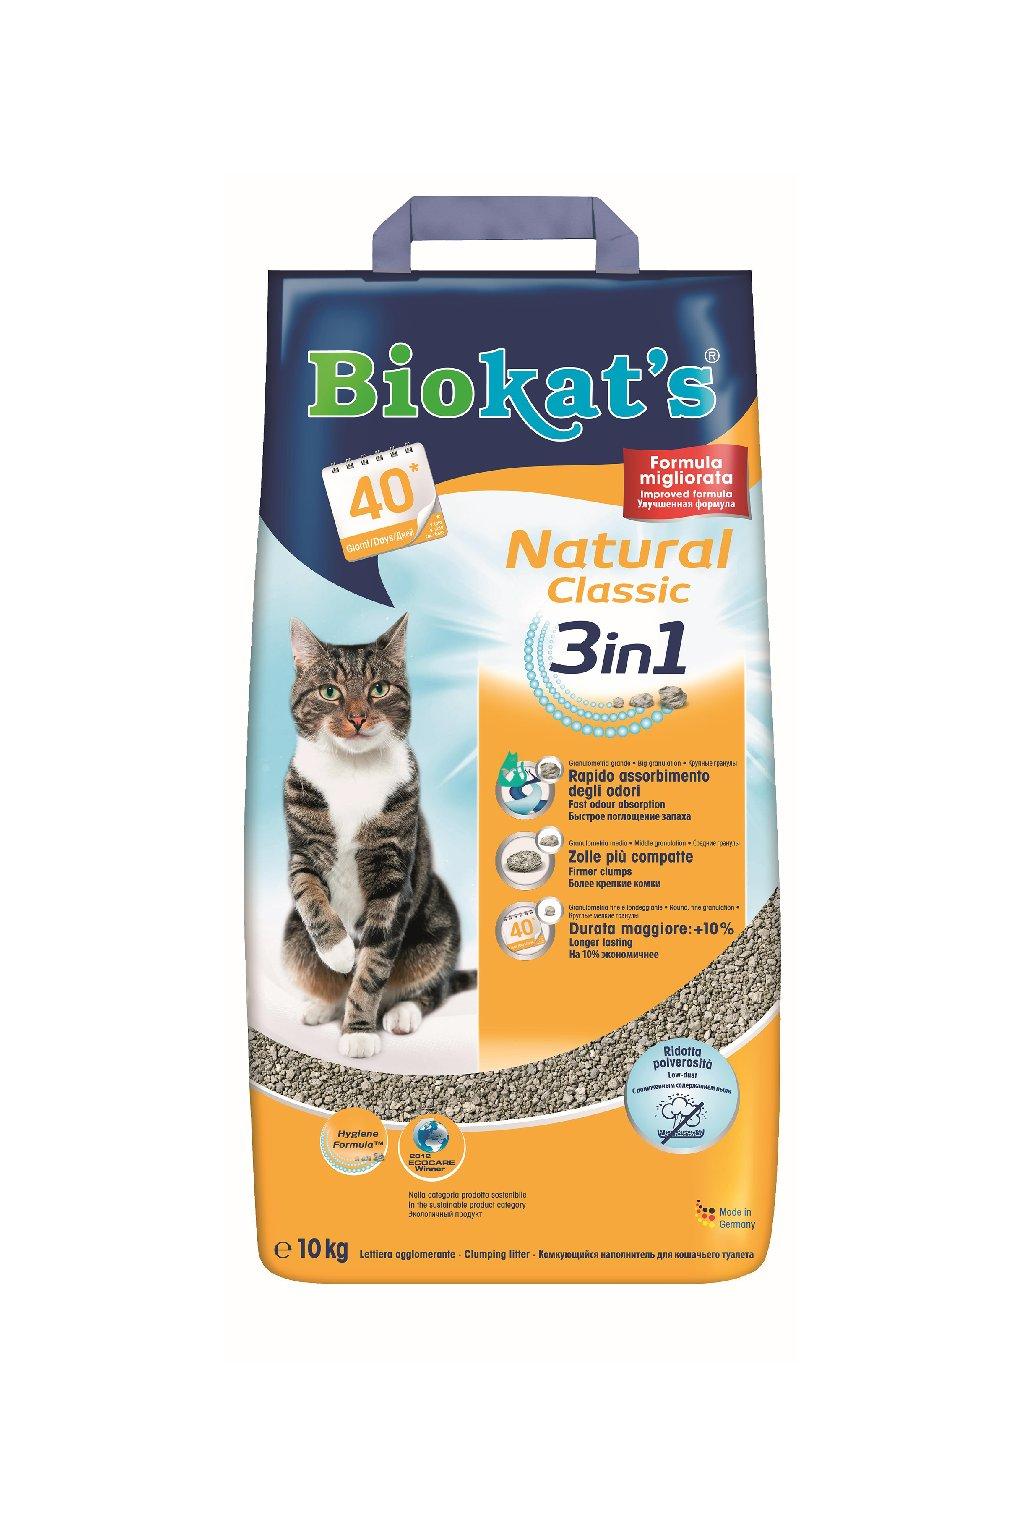 Podestýlka BIOKAT's Natural Classic 3in1, hrubší zrno